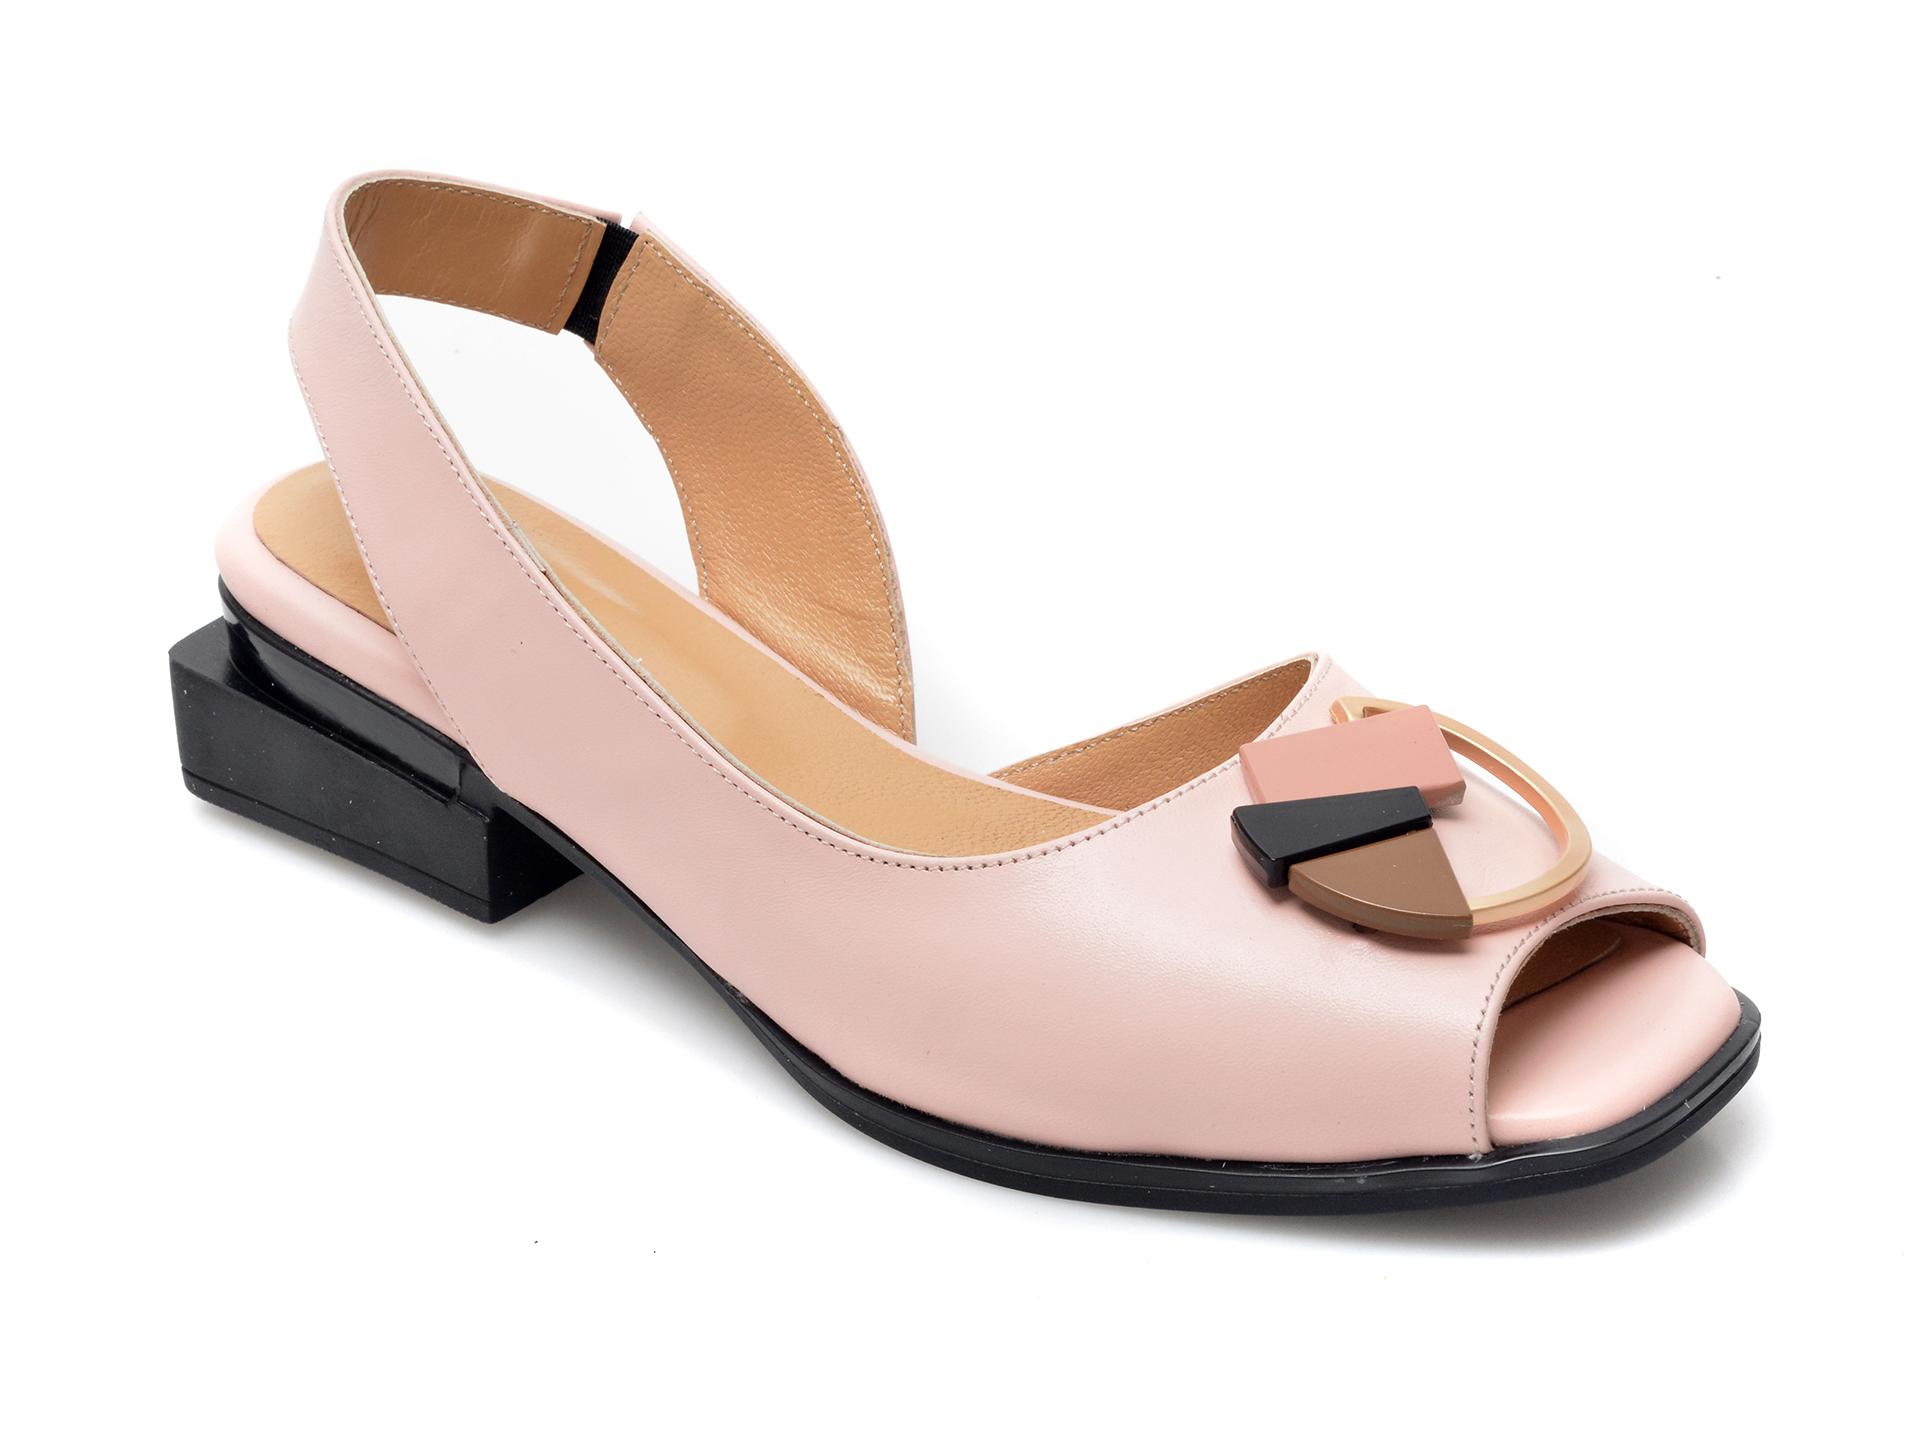 Sandale EPICA nude, 661082, din piele naturala imagine otter.ro 2021